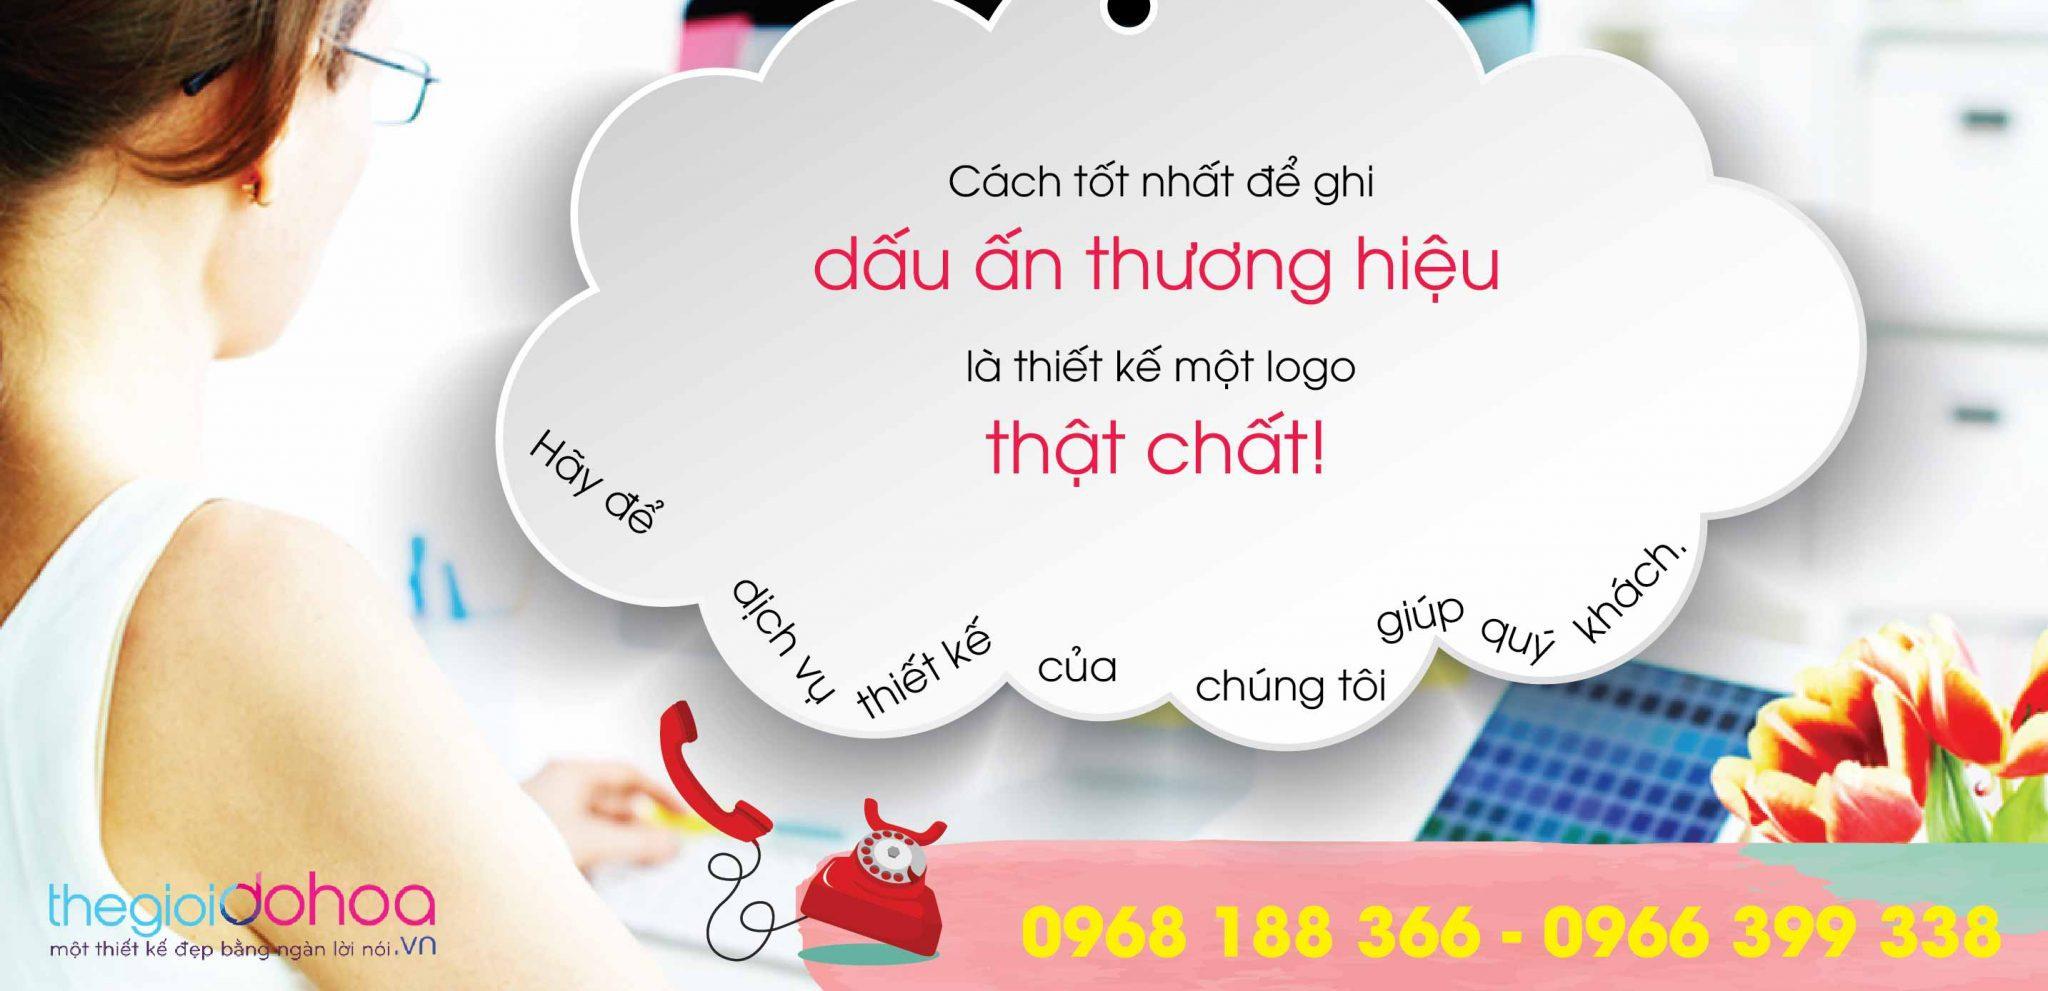 thiet ke logo cho shop online10